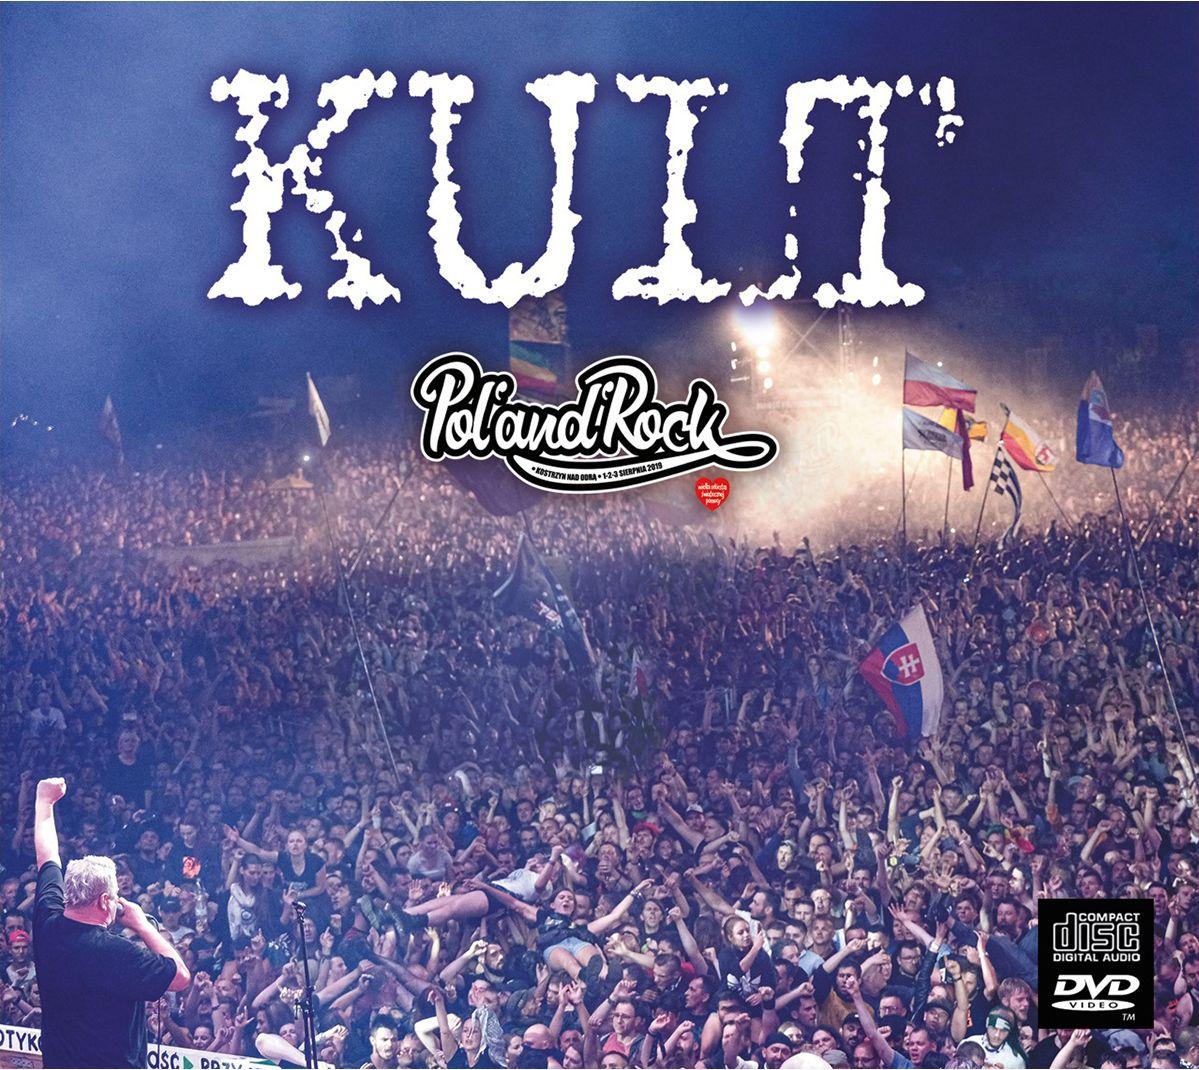 Kult - Live Pol'and'rock Festival 2019 album cover